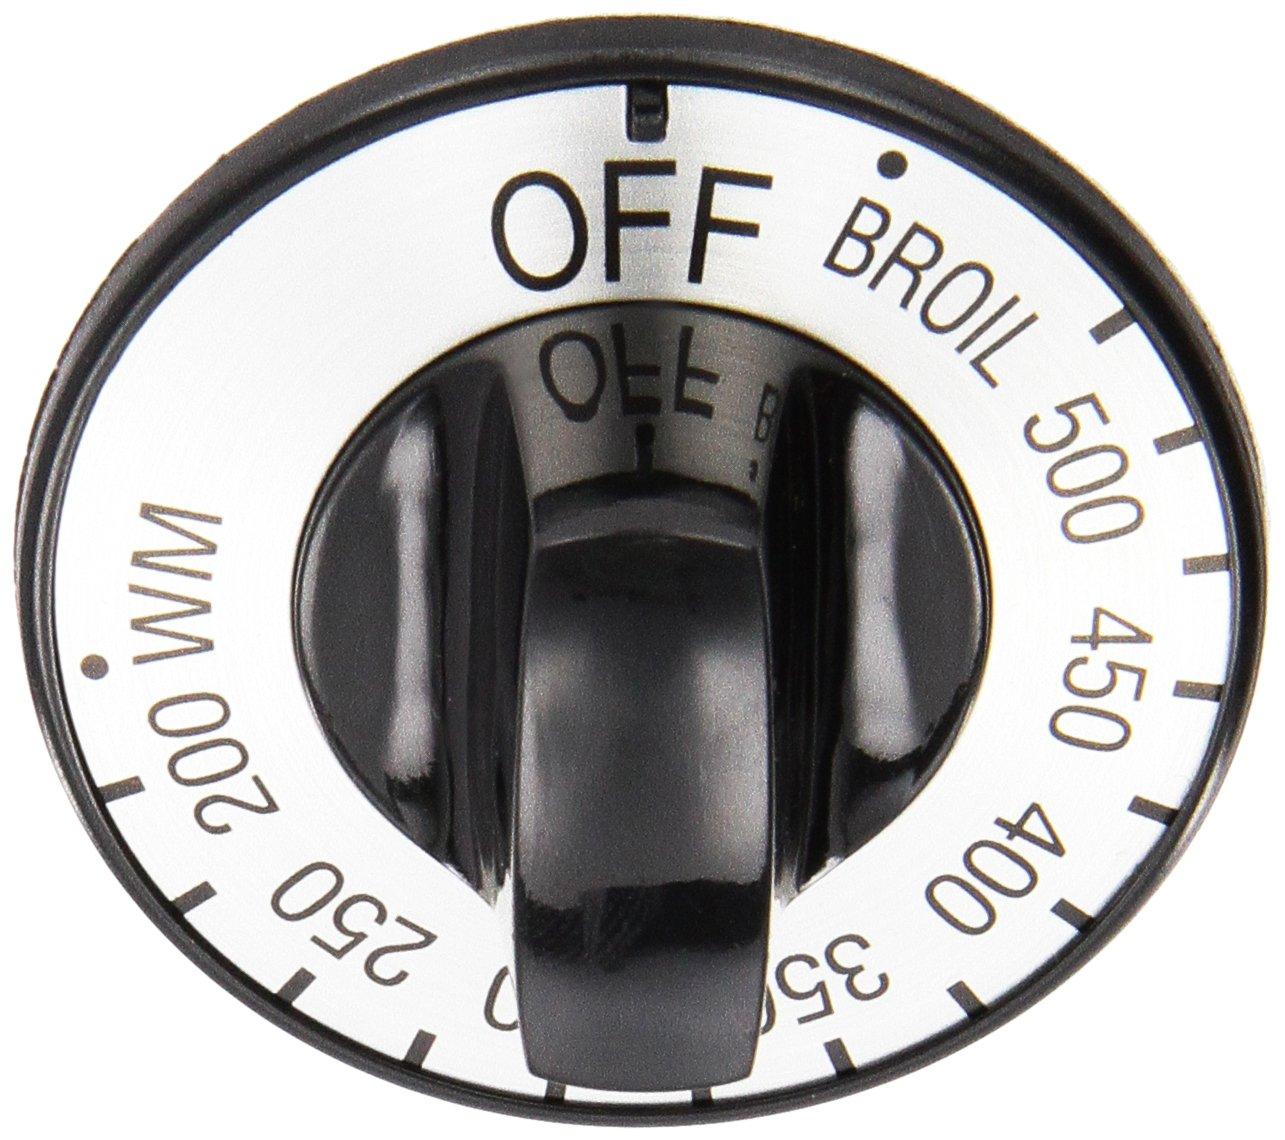 Frigidaire 5303285940 Thermostat Knob Range/Stove/Oven